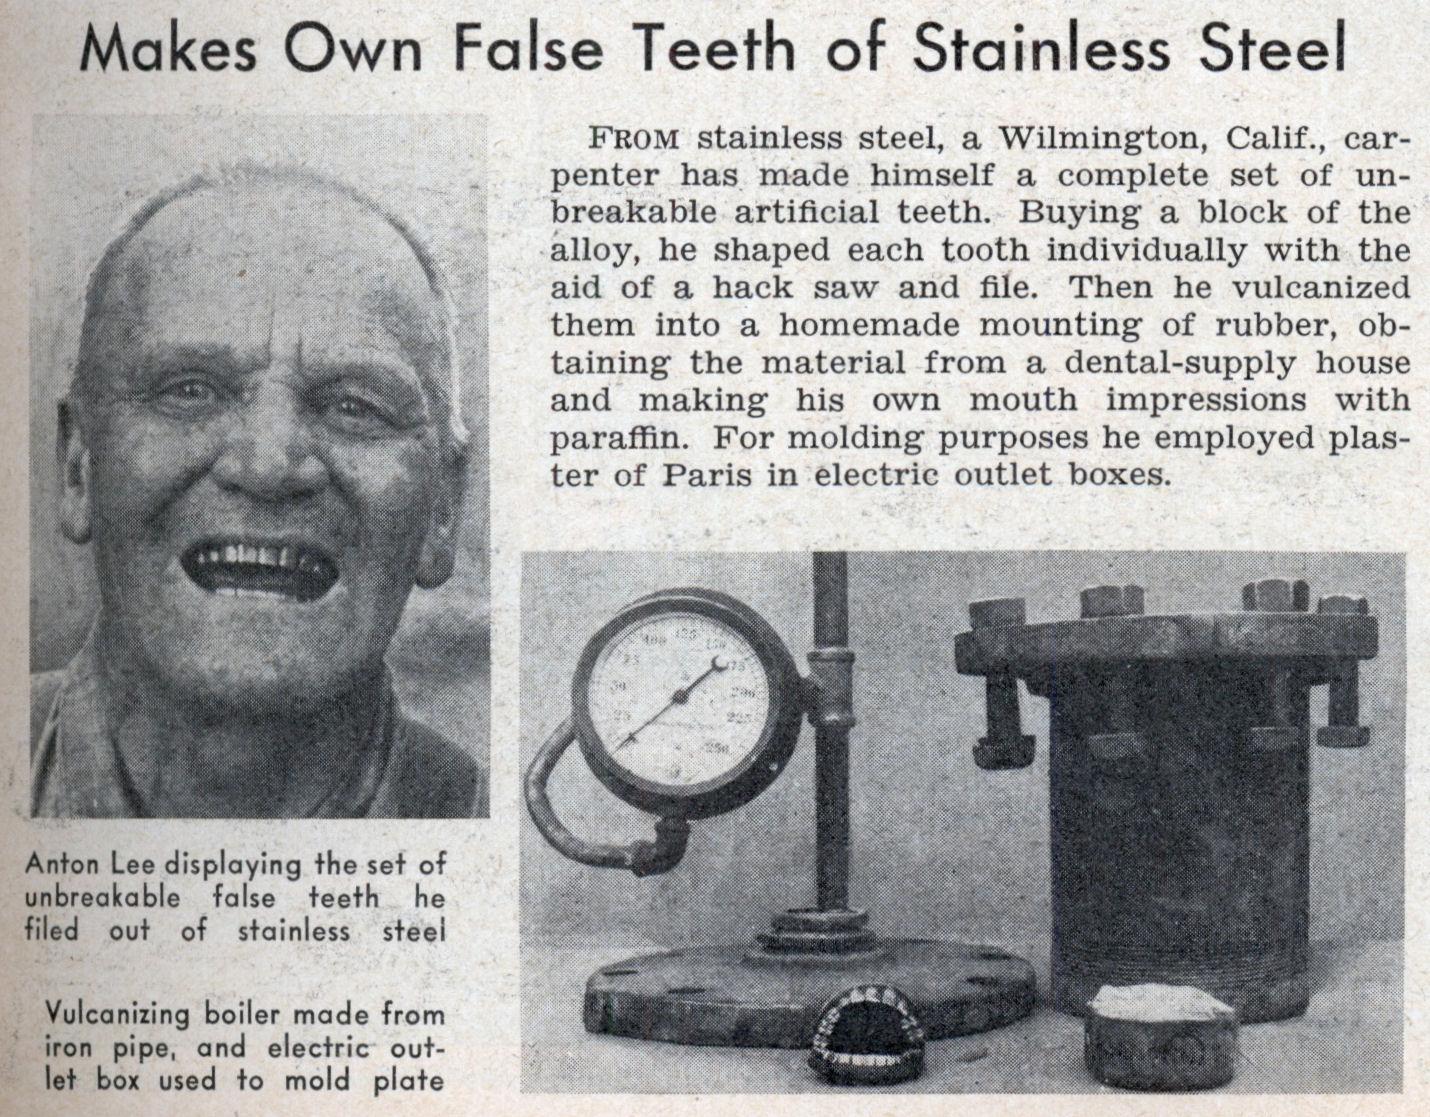 man_makes_fake_teeth-jpg.21949_TEETH_Staying Healthy_Squat the Planet_11:31 PM